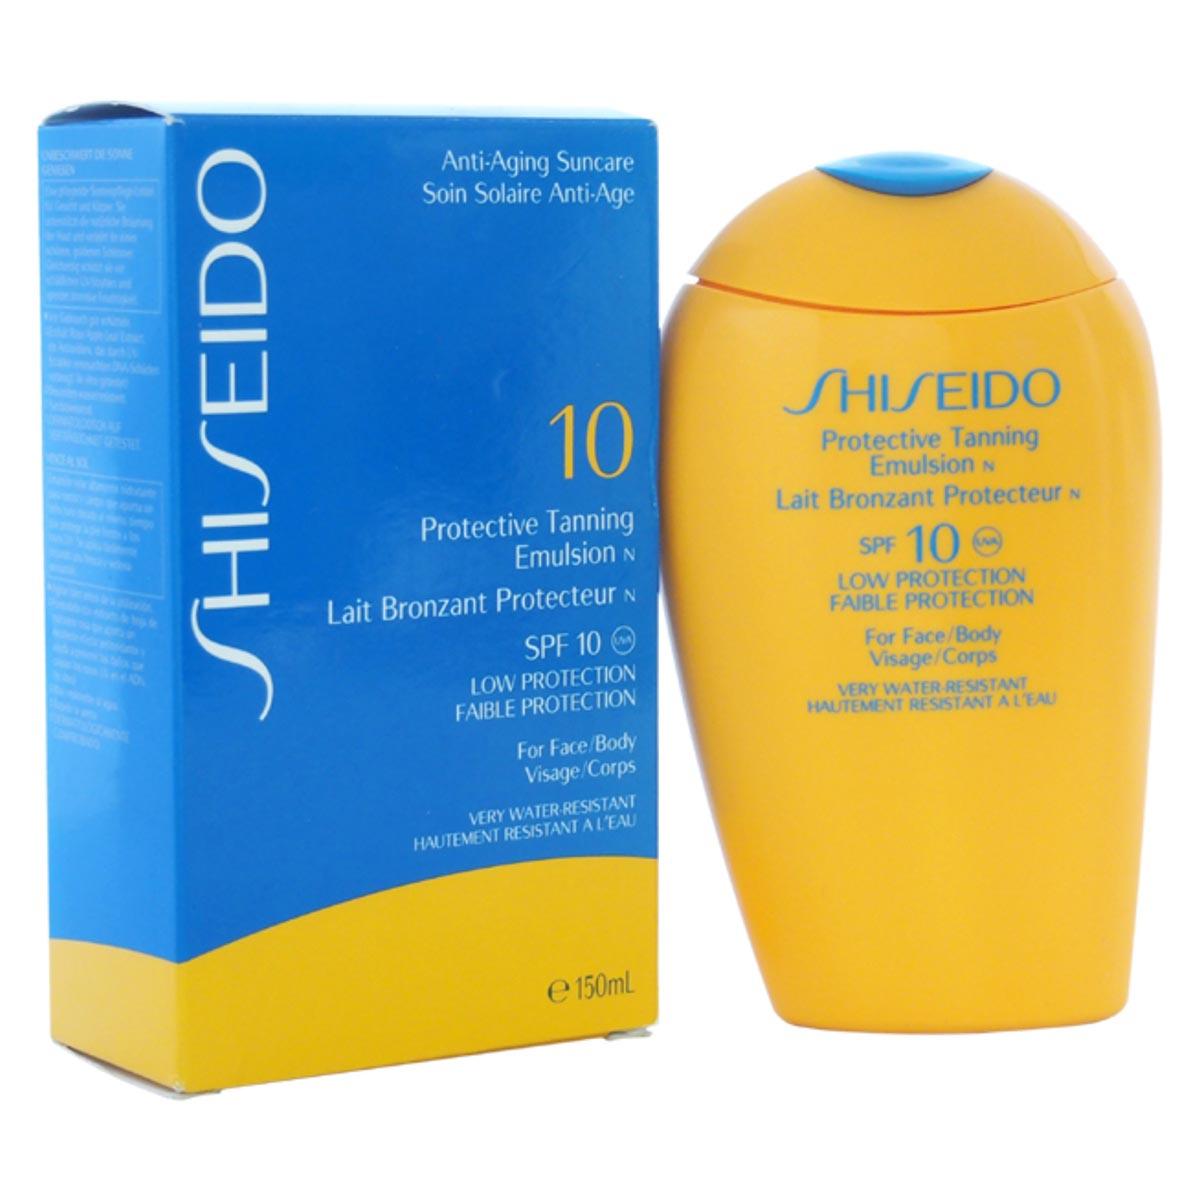 Shiseido anti aging suncare protective tanning emulsion spf10 150ml